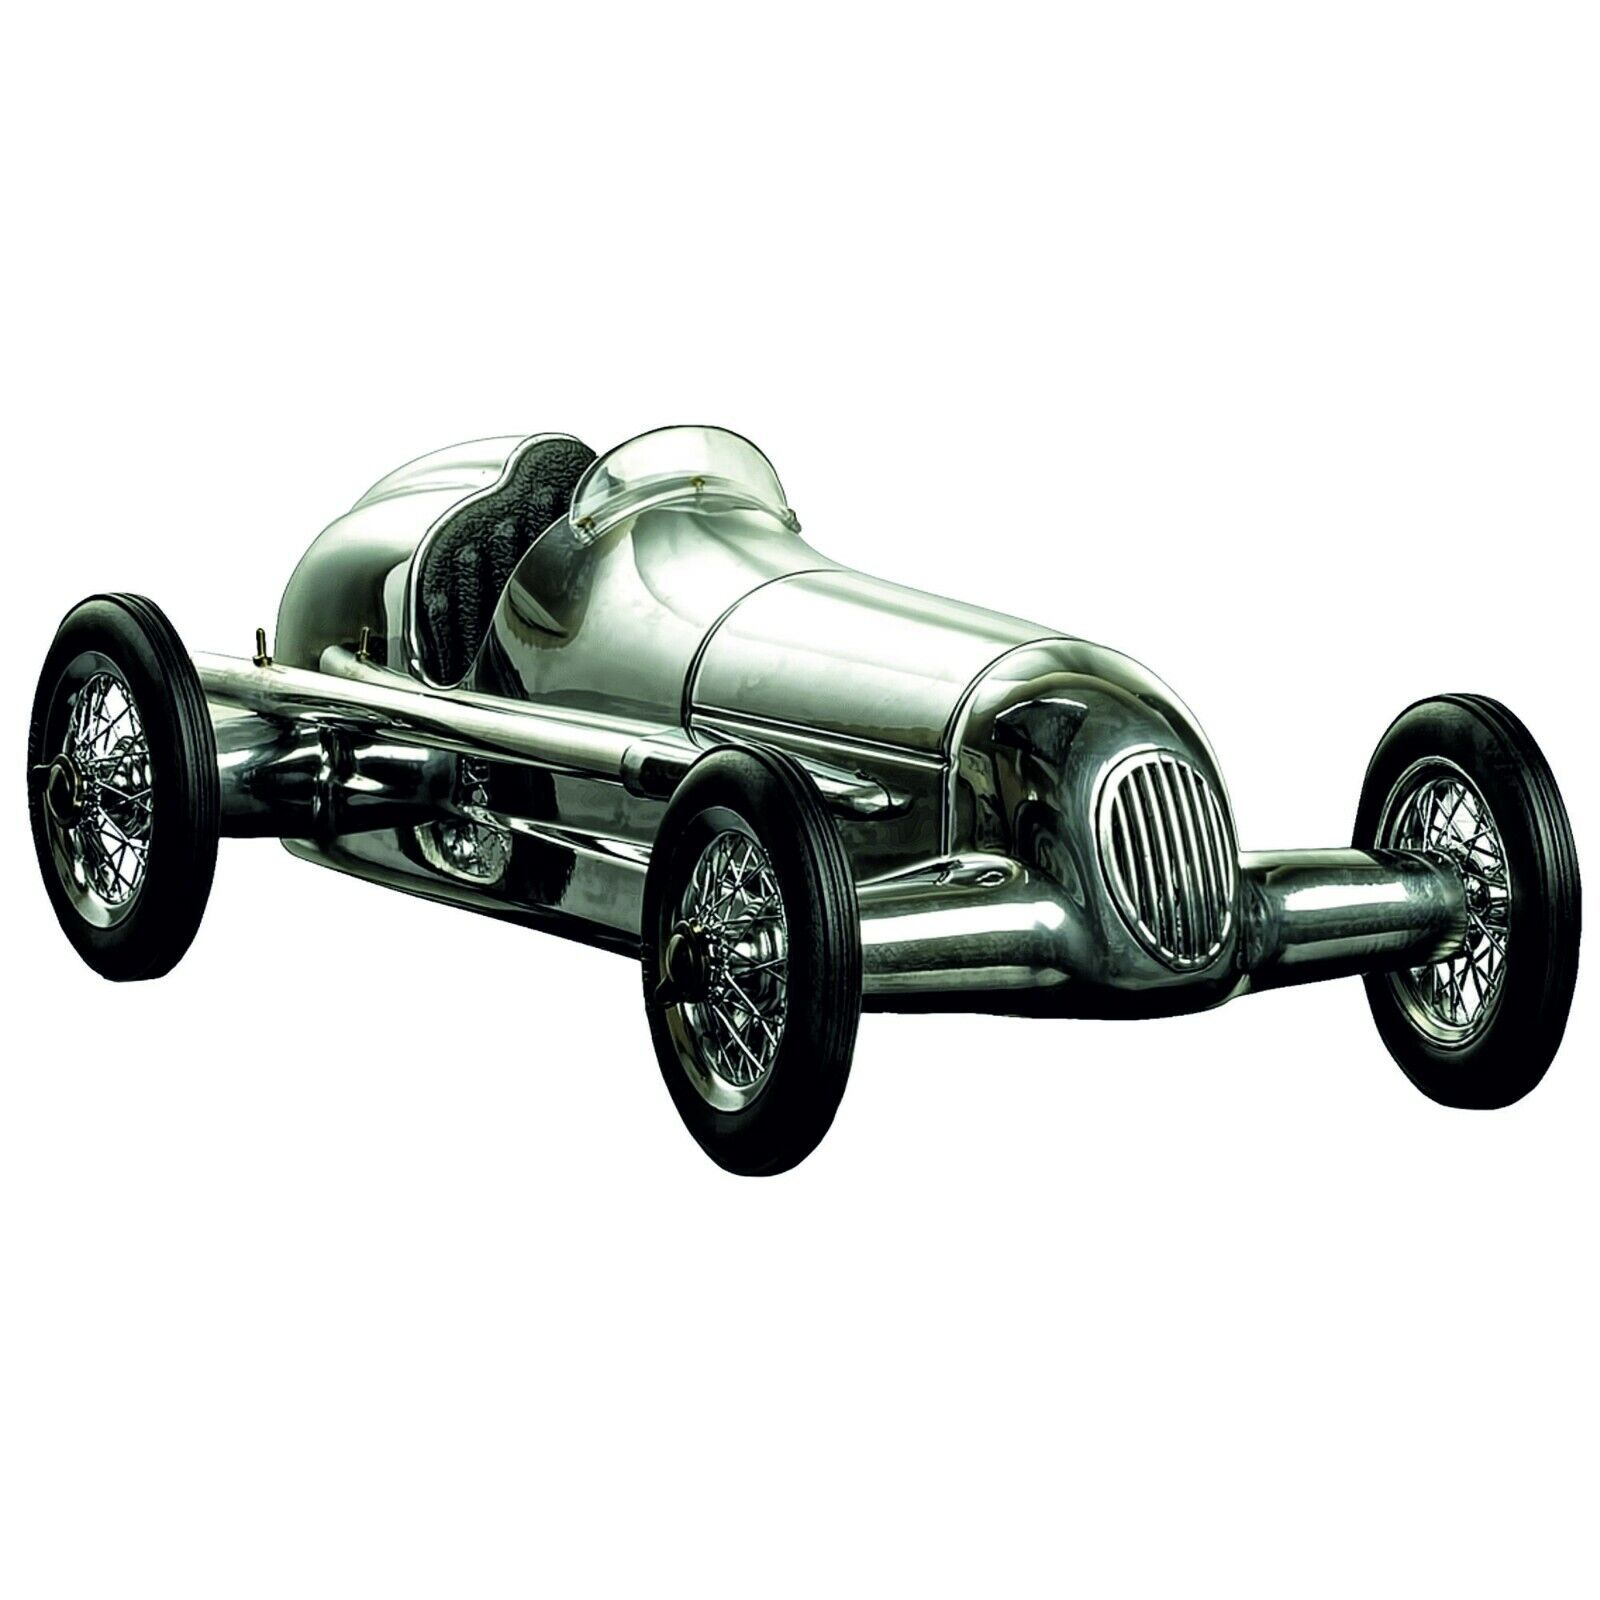 Auto silverpfeil - L. 30,5 cm